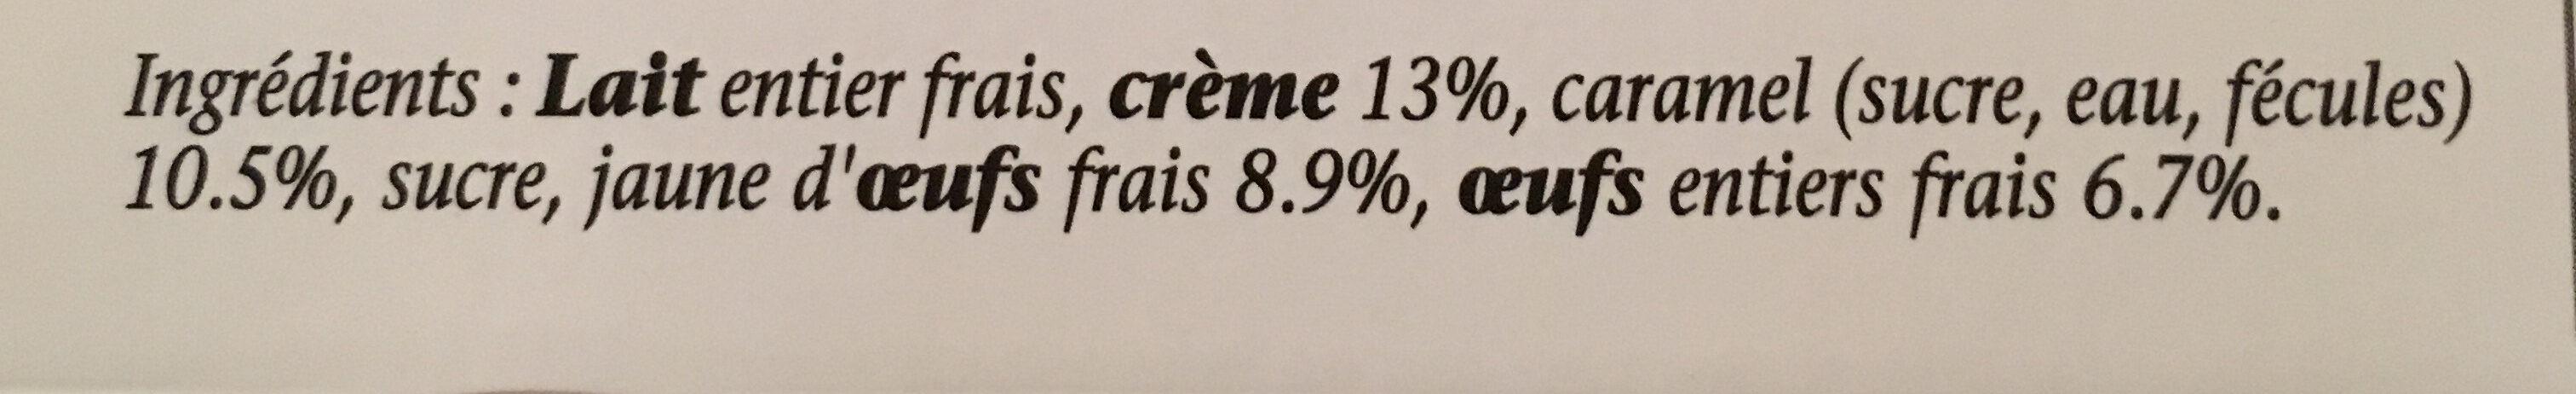 Crème caramel - Ingredients